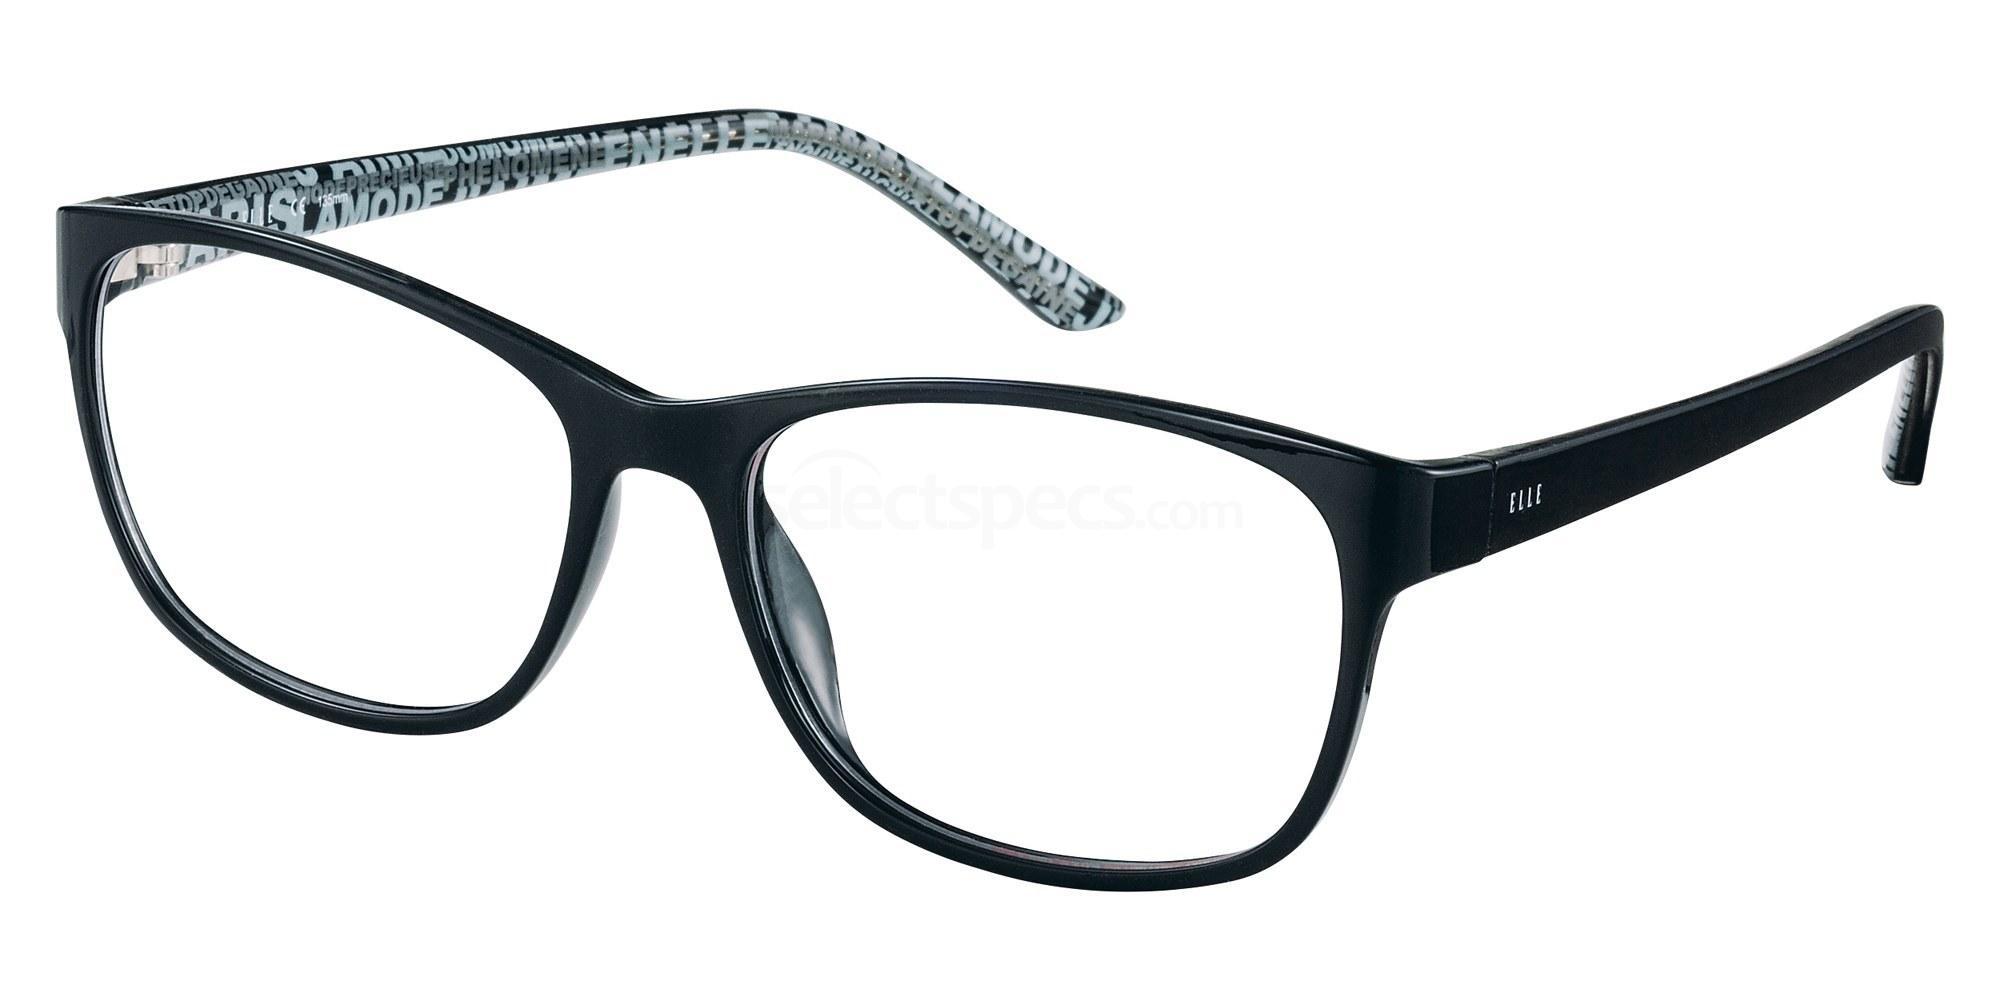 BK EL13398 Glasses, ELLE